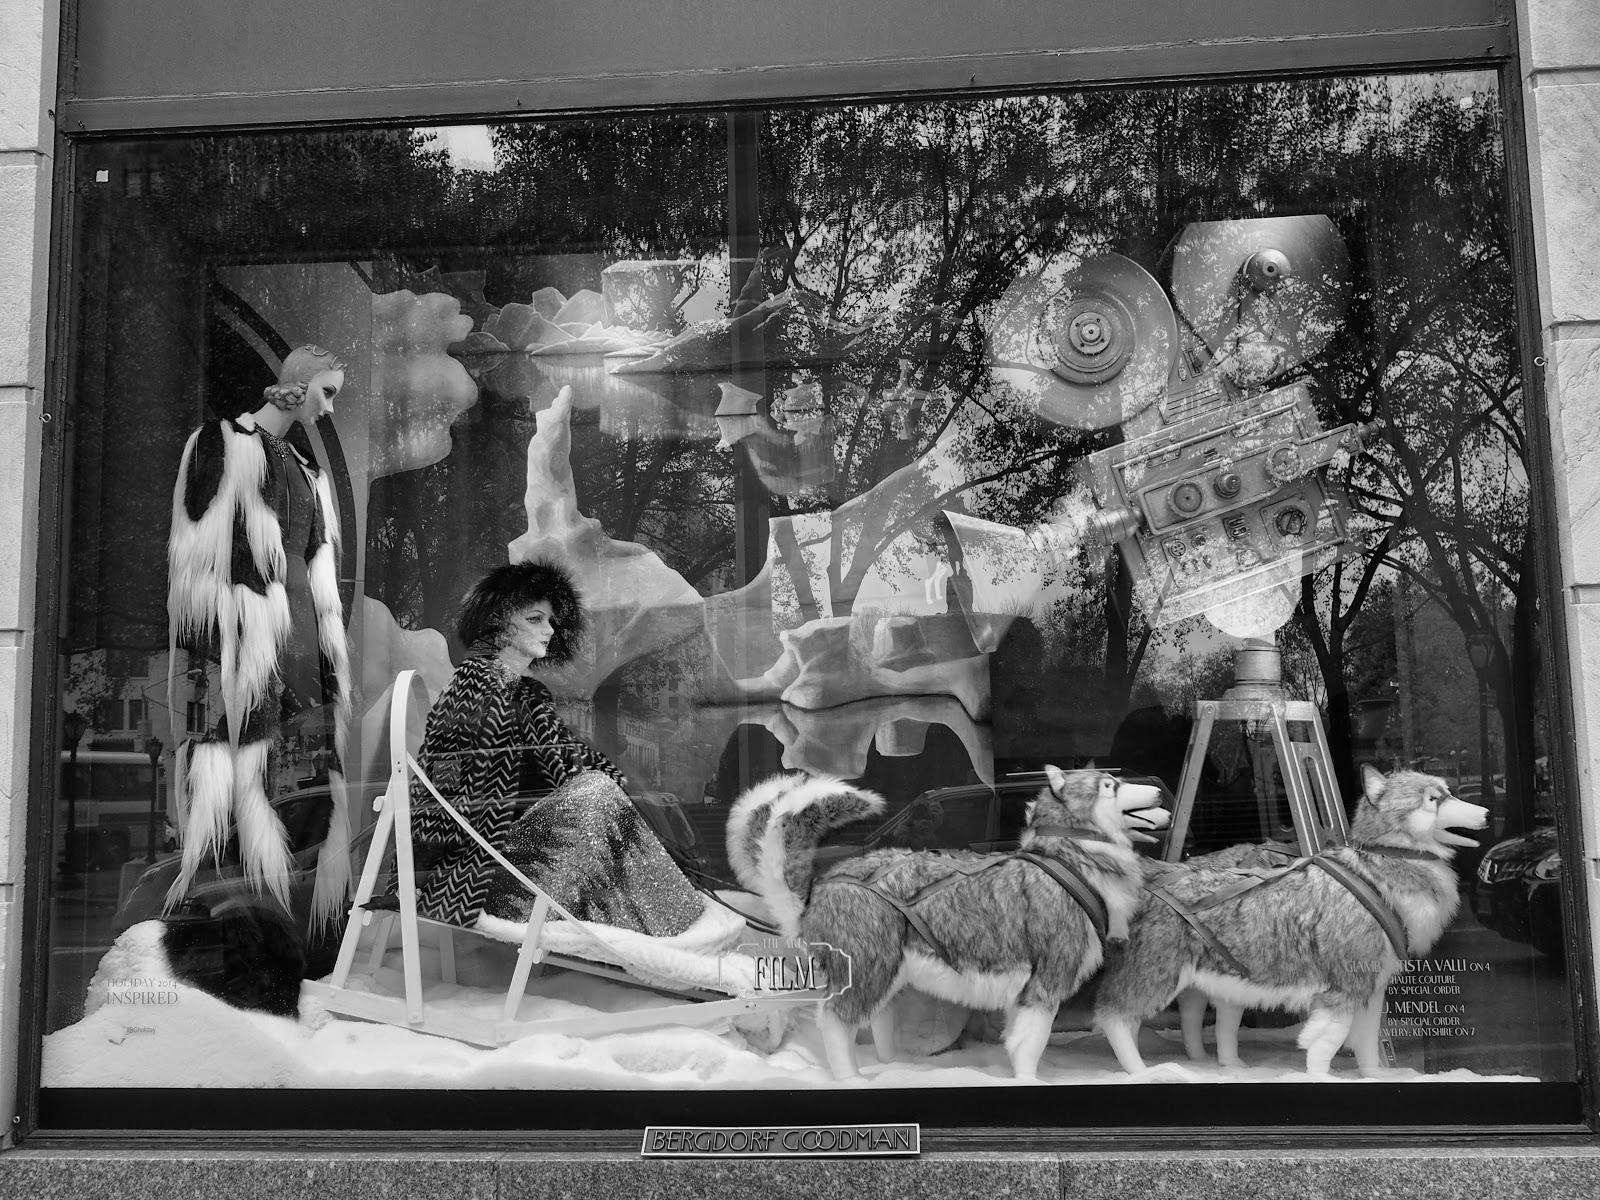 Mush #Mush #bgwindows #windowwatchers #holidaywindows #5thavenuewindows #NYC  #holidays #besttimeoftheyear #nyc ©2014 Nancy Lundebjerg